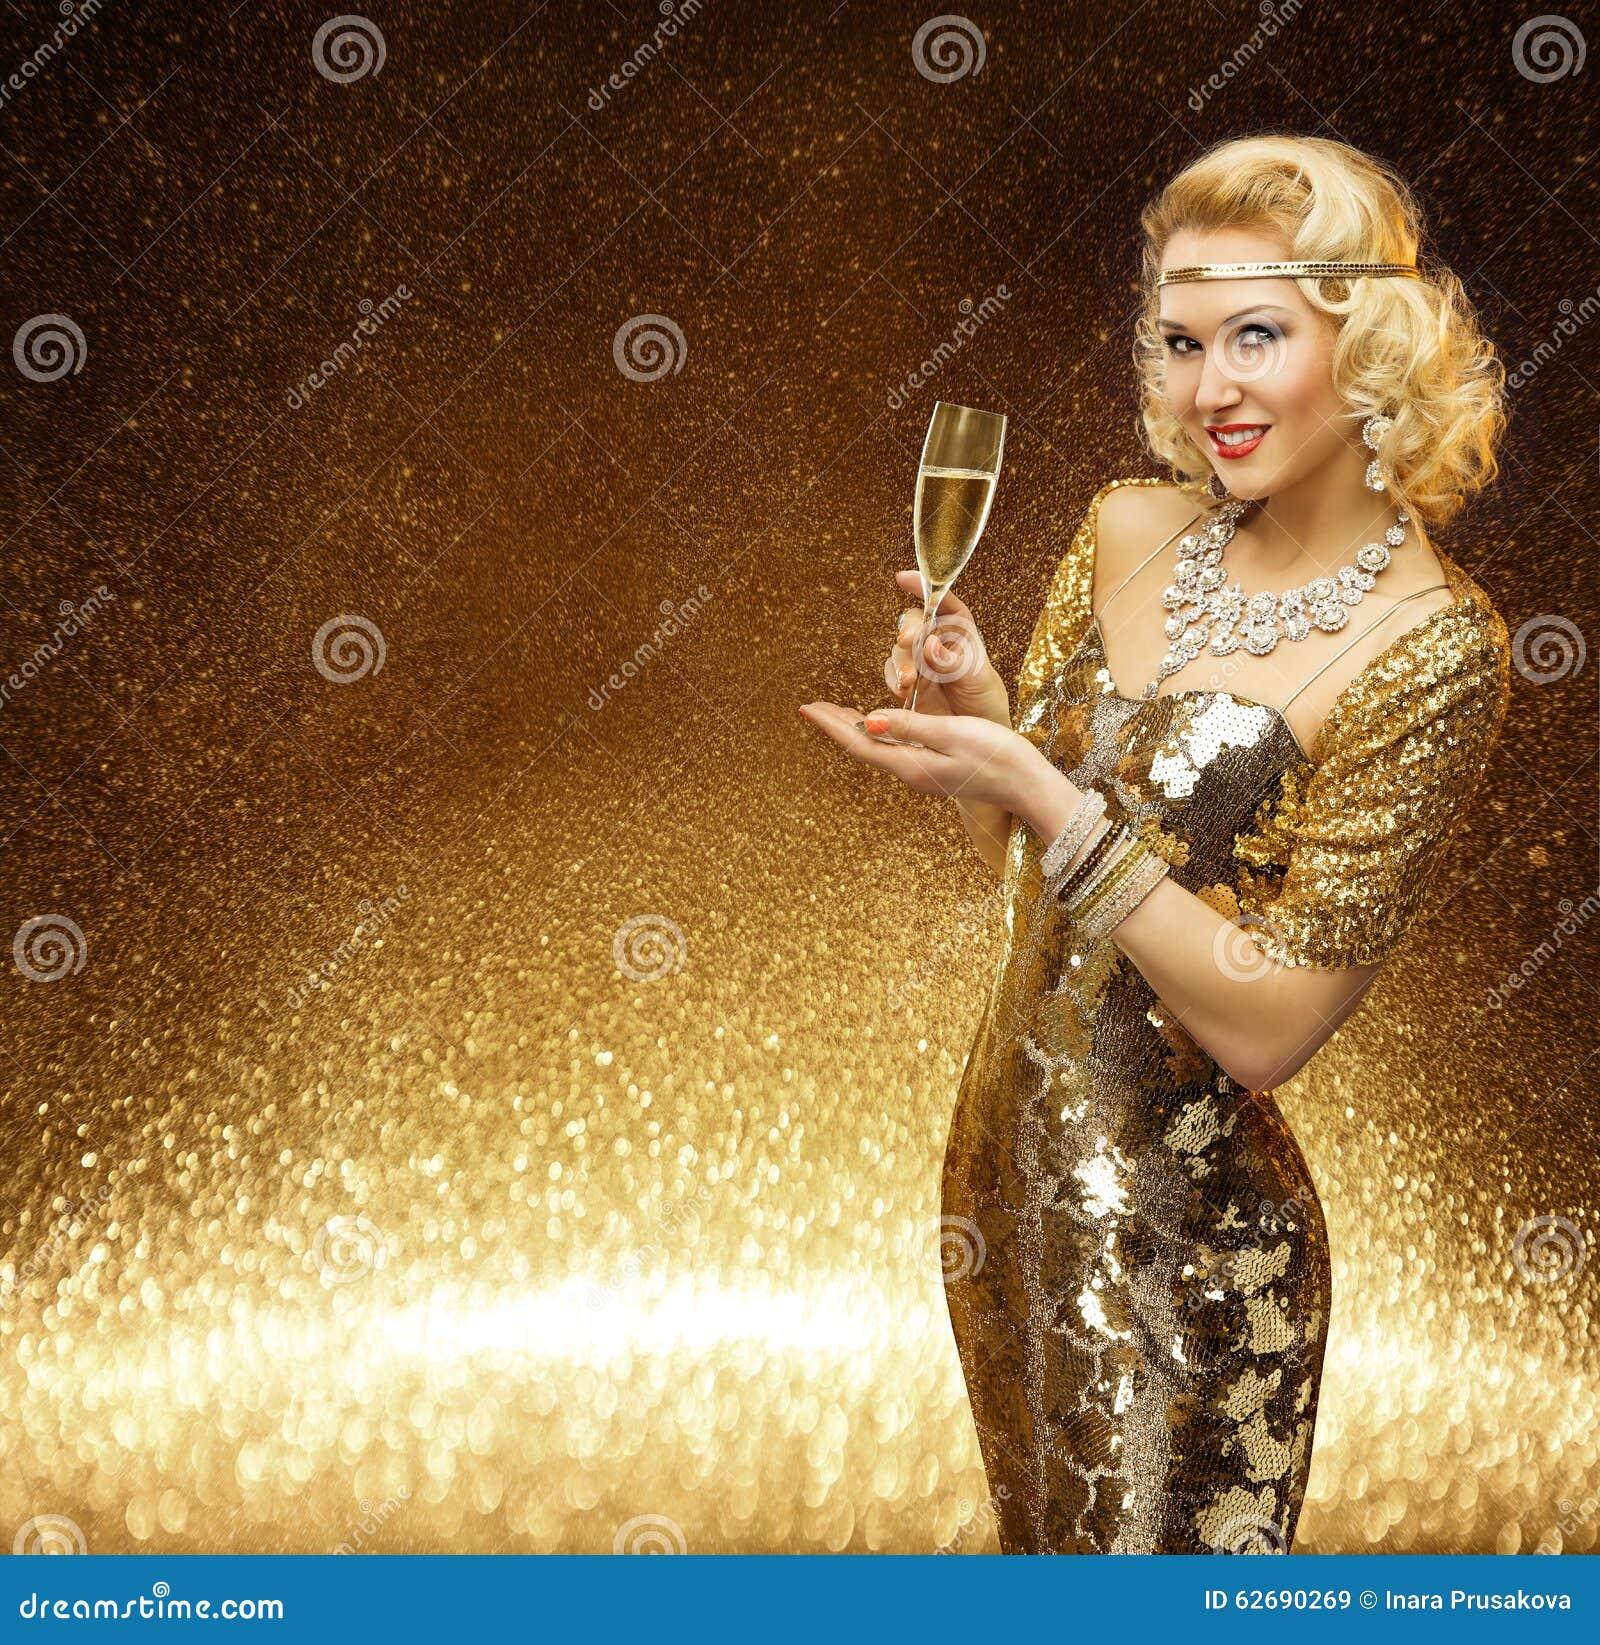 Frauen-Gold, Promi Dame Champagne Glass, goldenes Mode-Modell